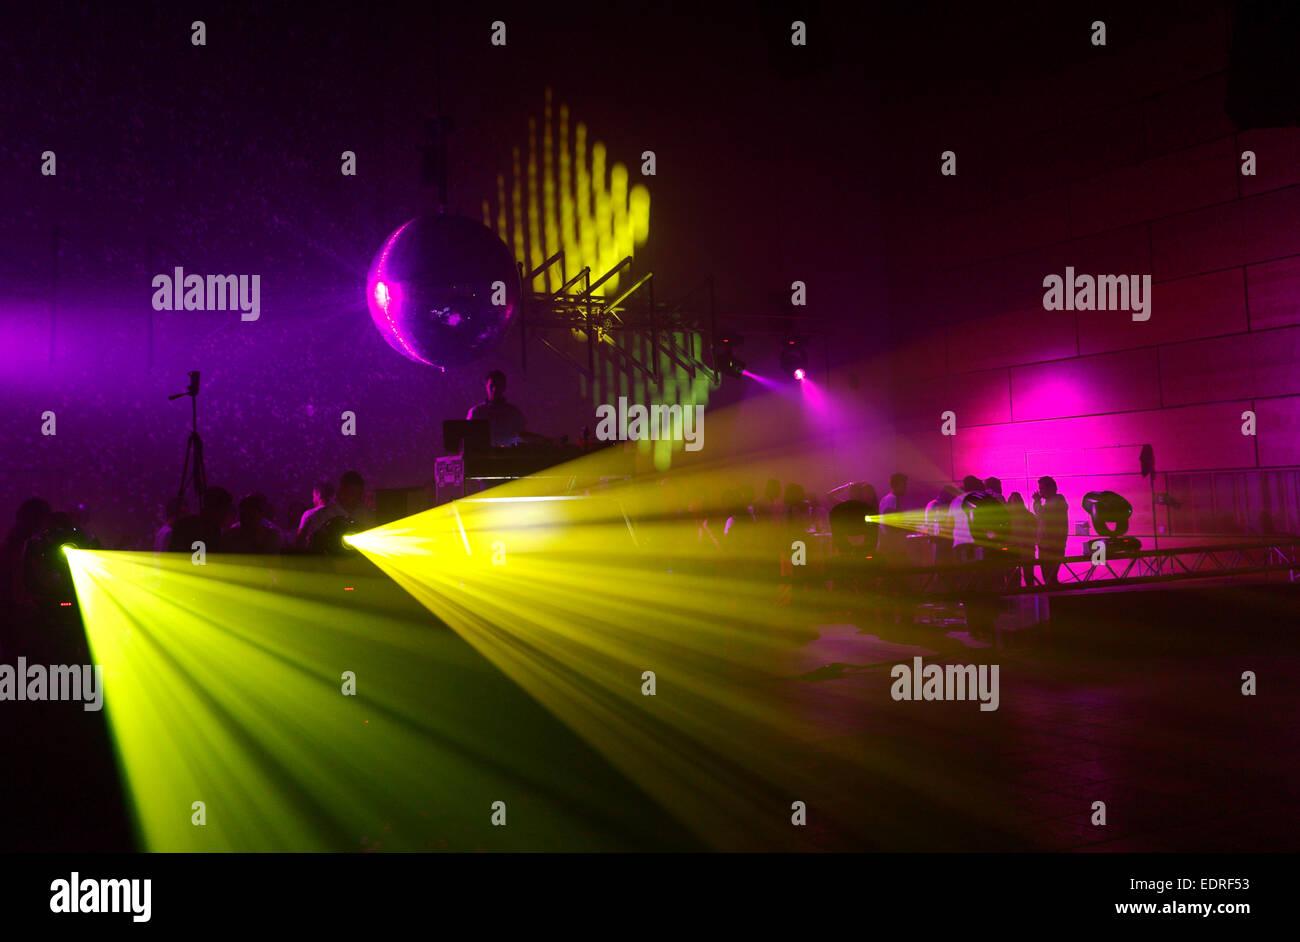 Discoteca luci, luci laser Immagini Stock